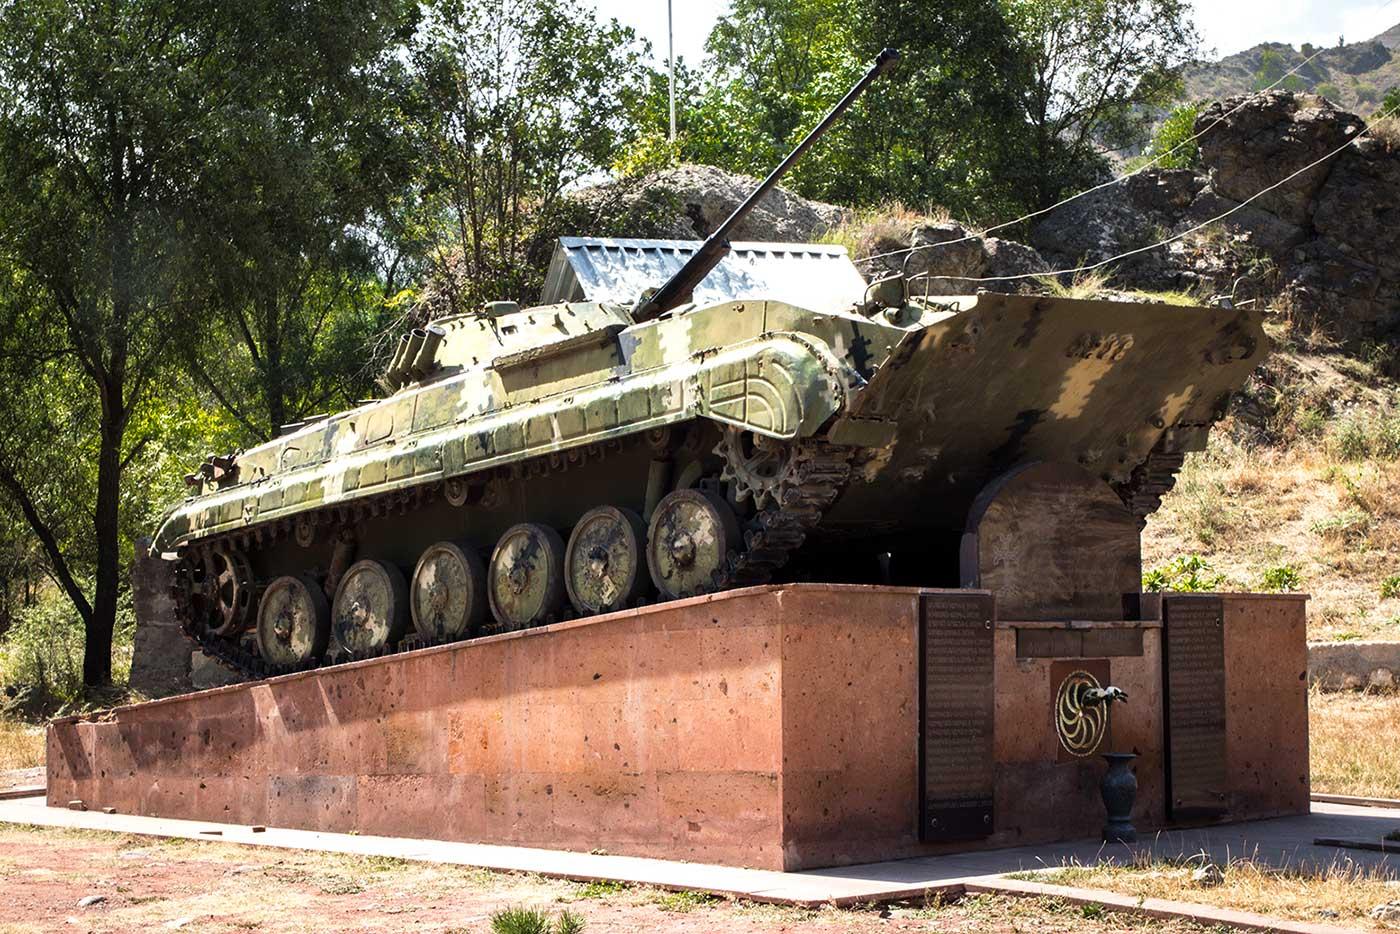 Abandoned tank memorial in Nagorno-Karabakh.